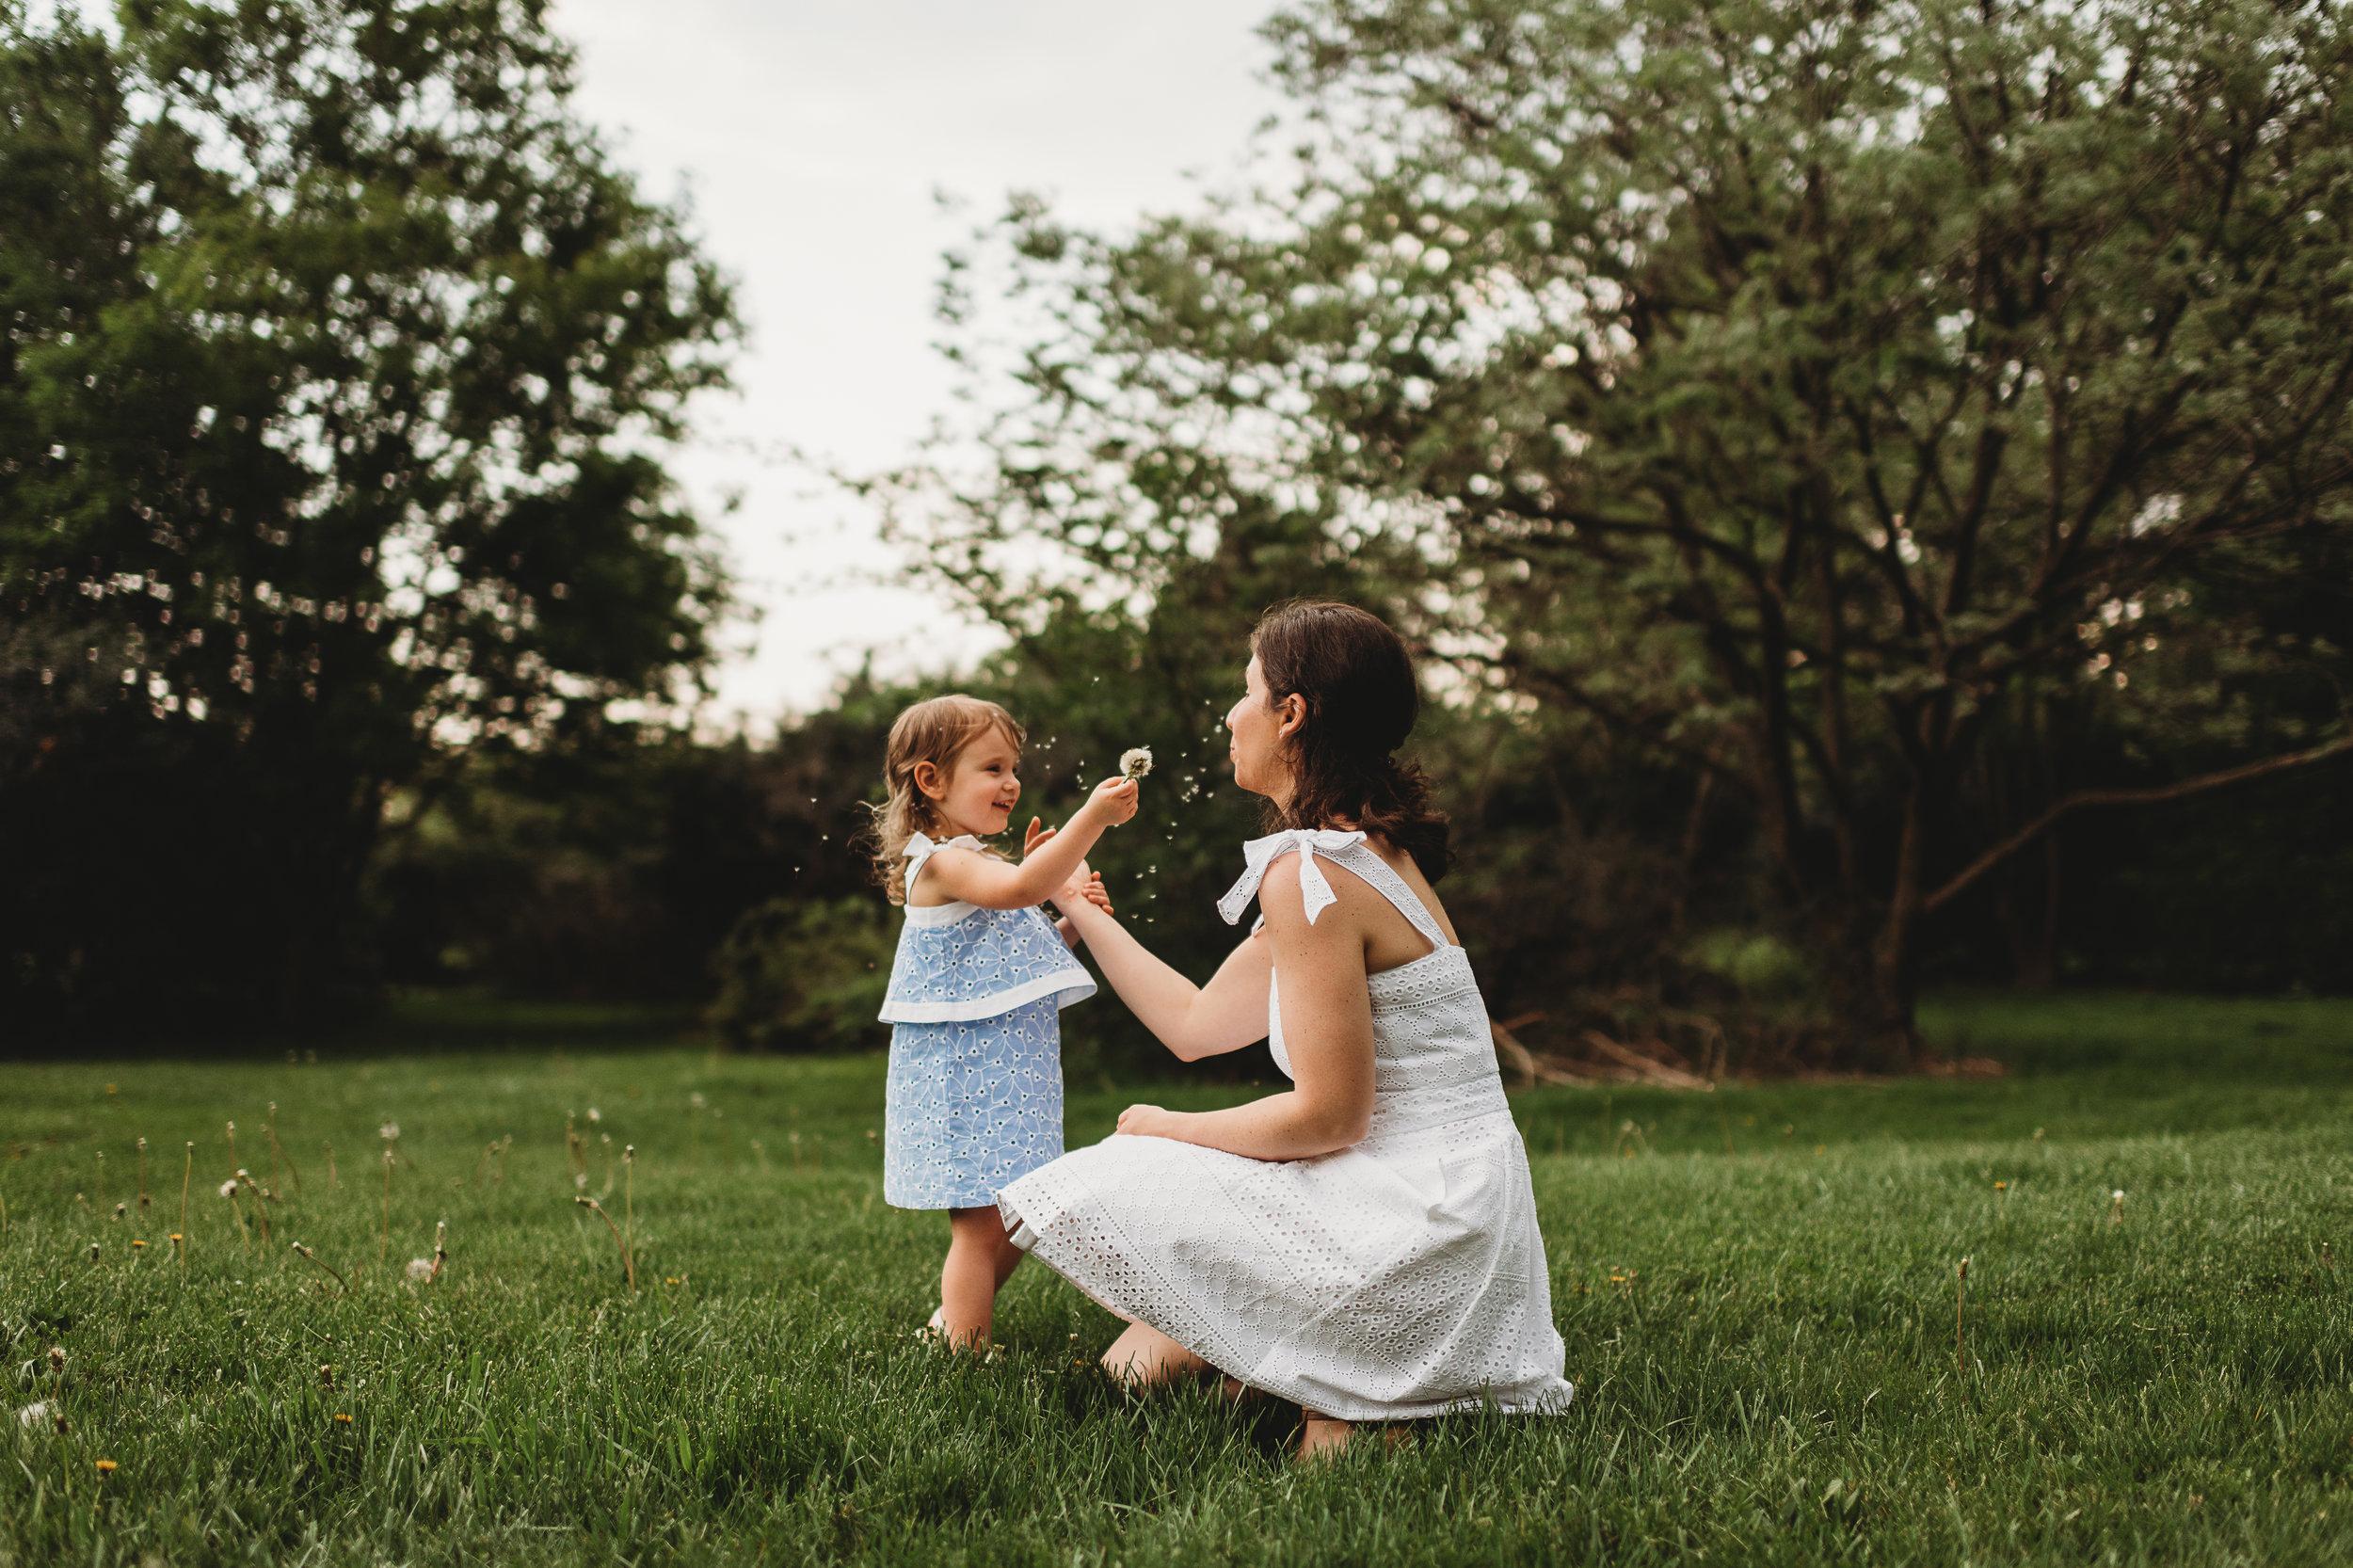 Laudien_Motherhood_New _Jersey_Photographer_Rutgers_Gardens_11